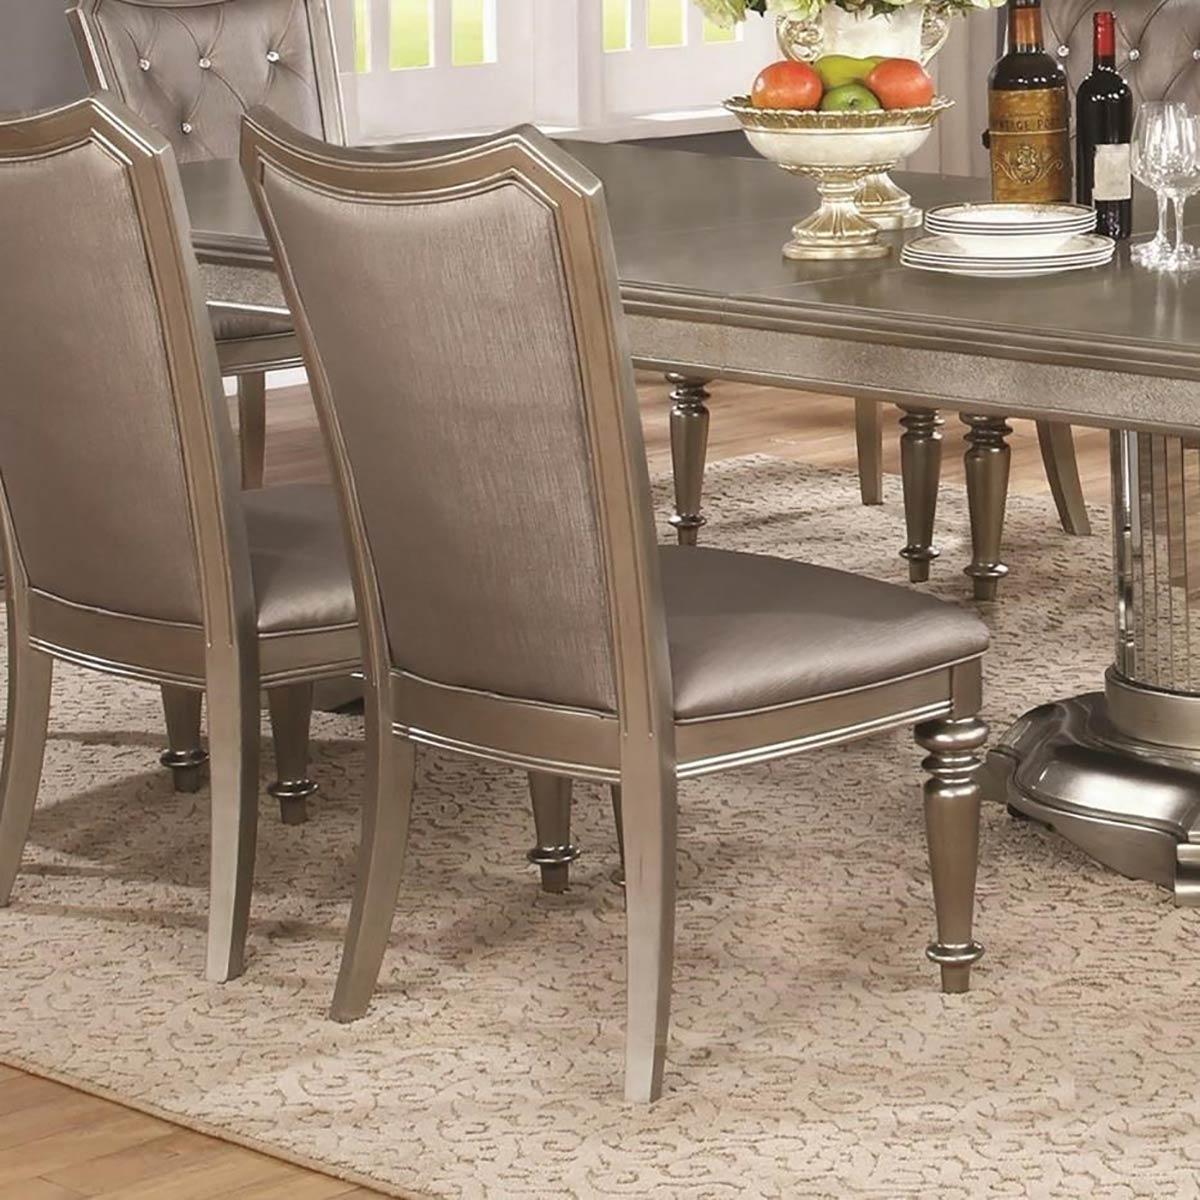 Coaster Danette Side Chair - Metallic Platinum